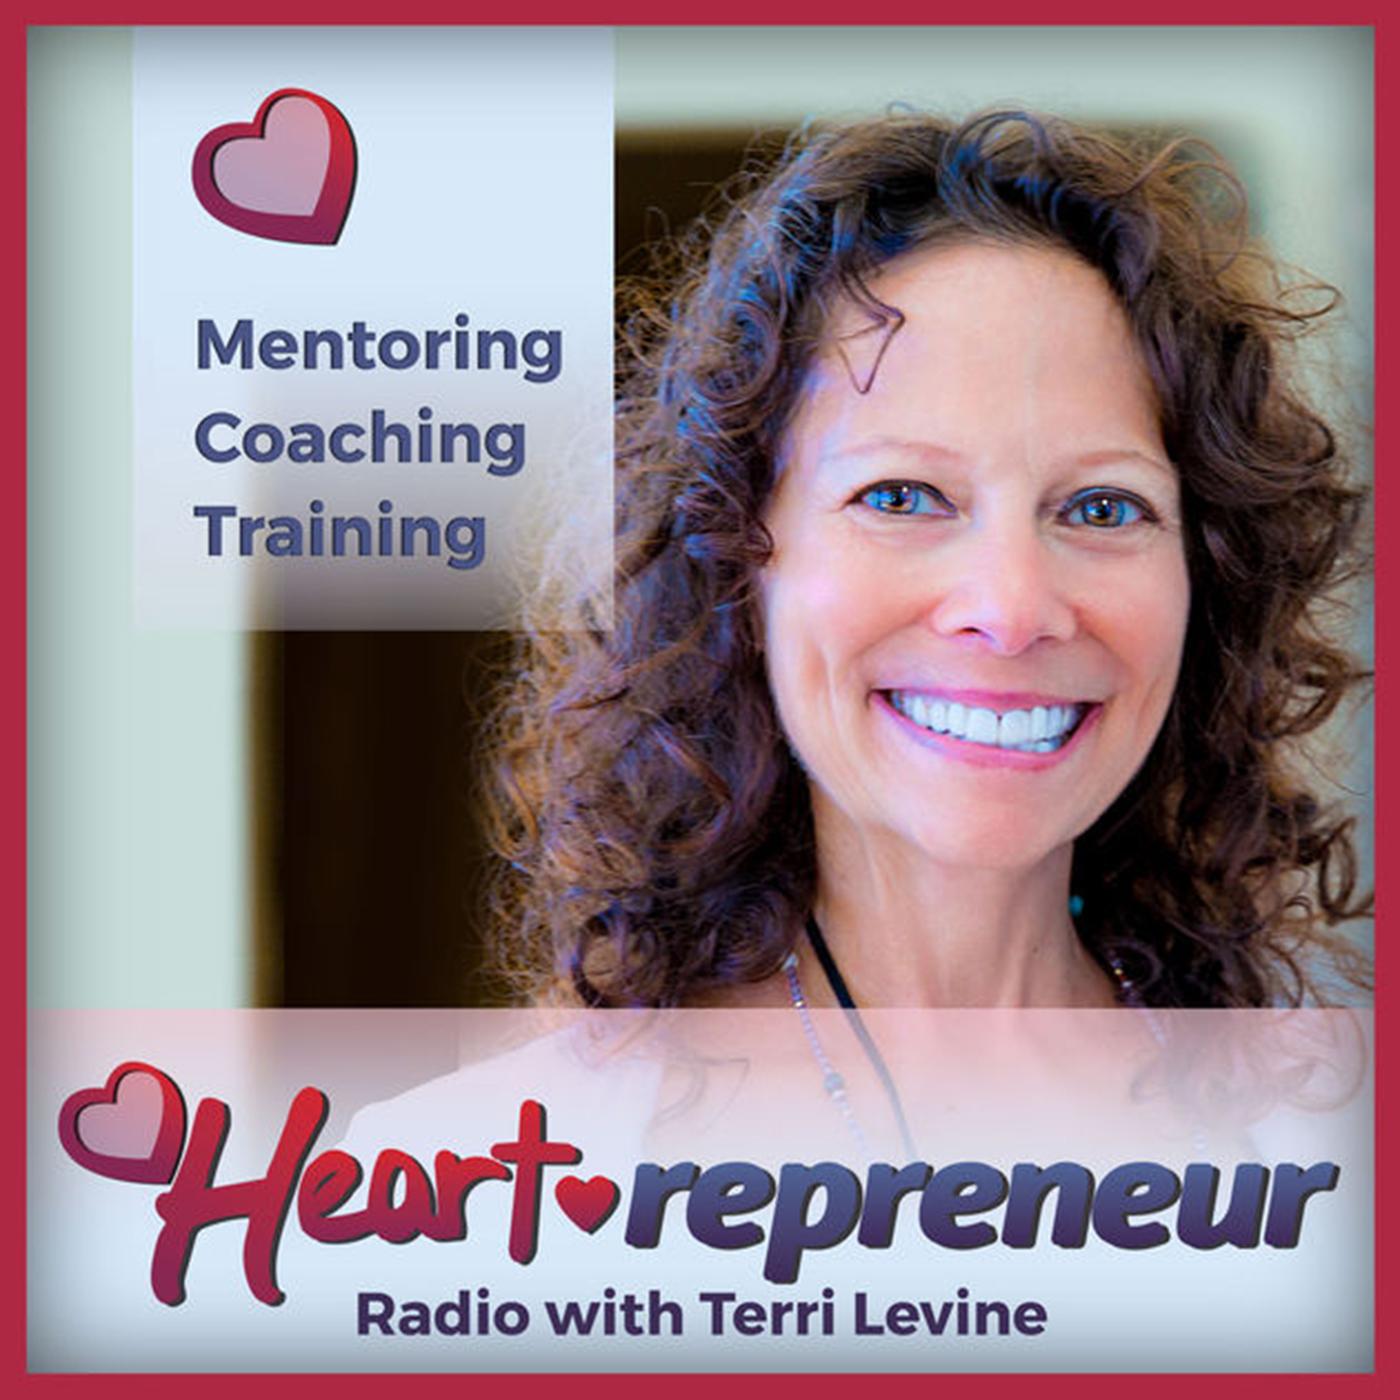 Heartrepreneur® Radio show art